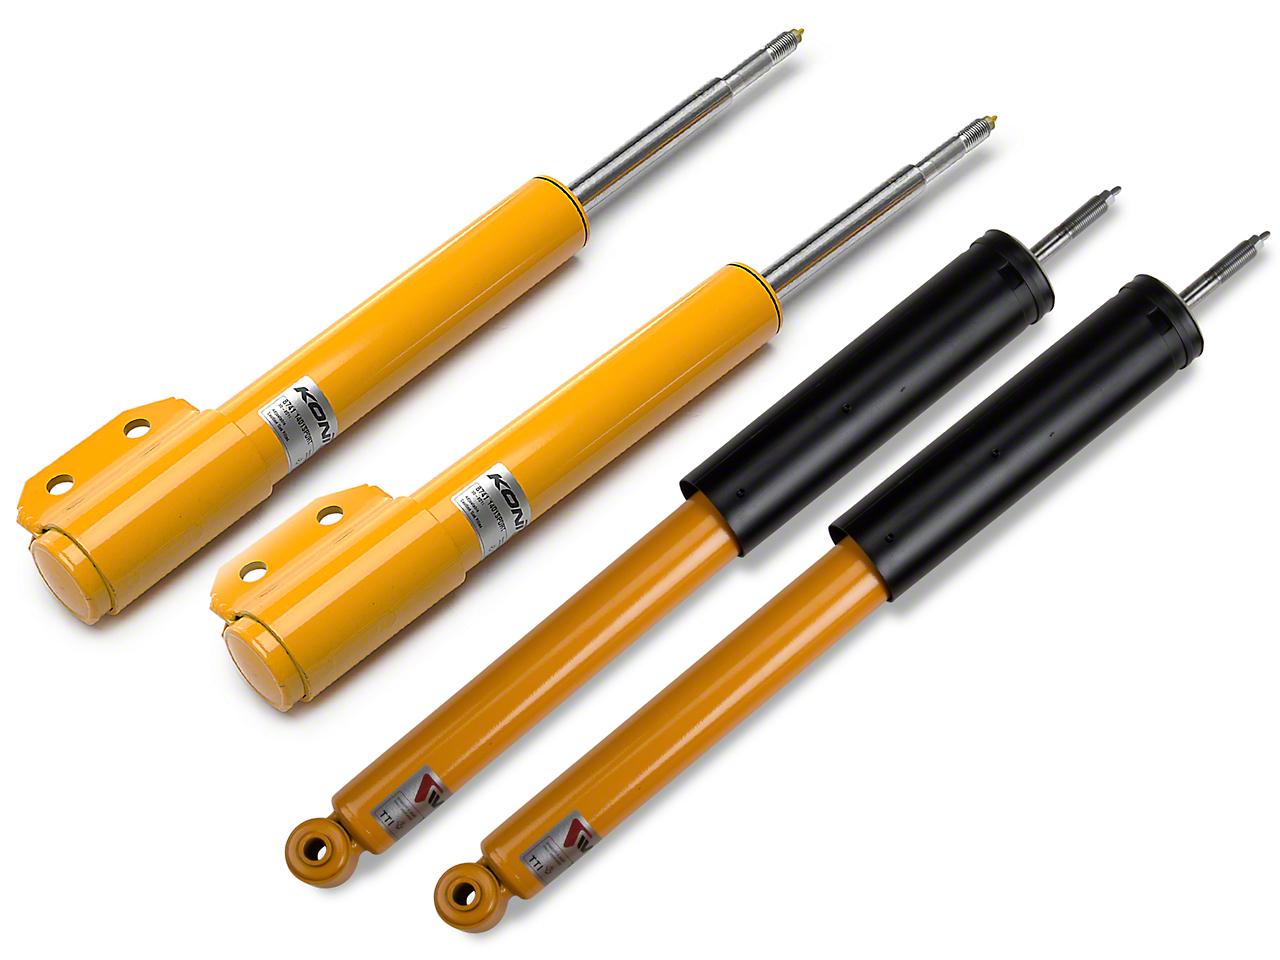 KONI Sport Adjustable Shock & Strut Kit (94-04 GT, V6, Mach 1; 94-98 Cobra)